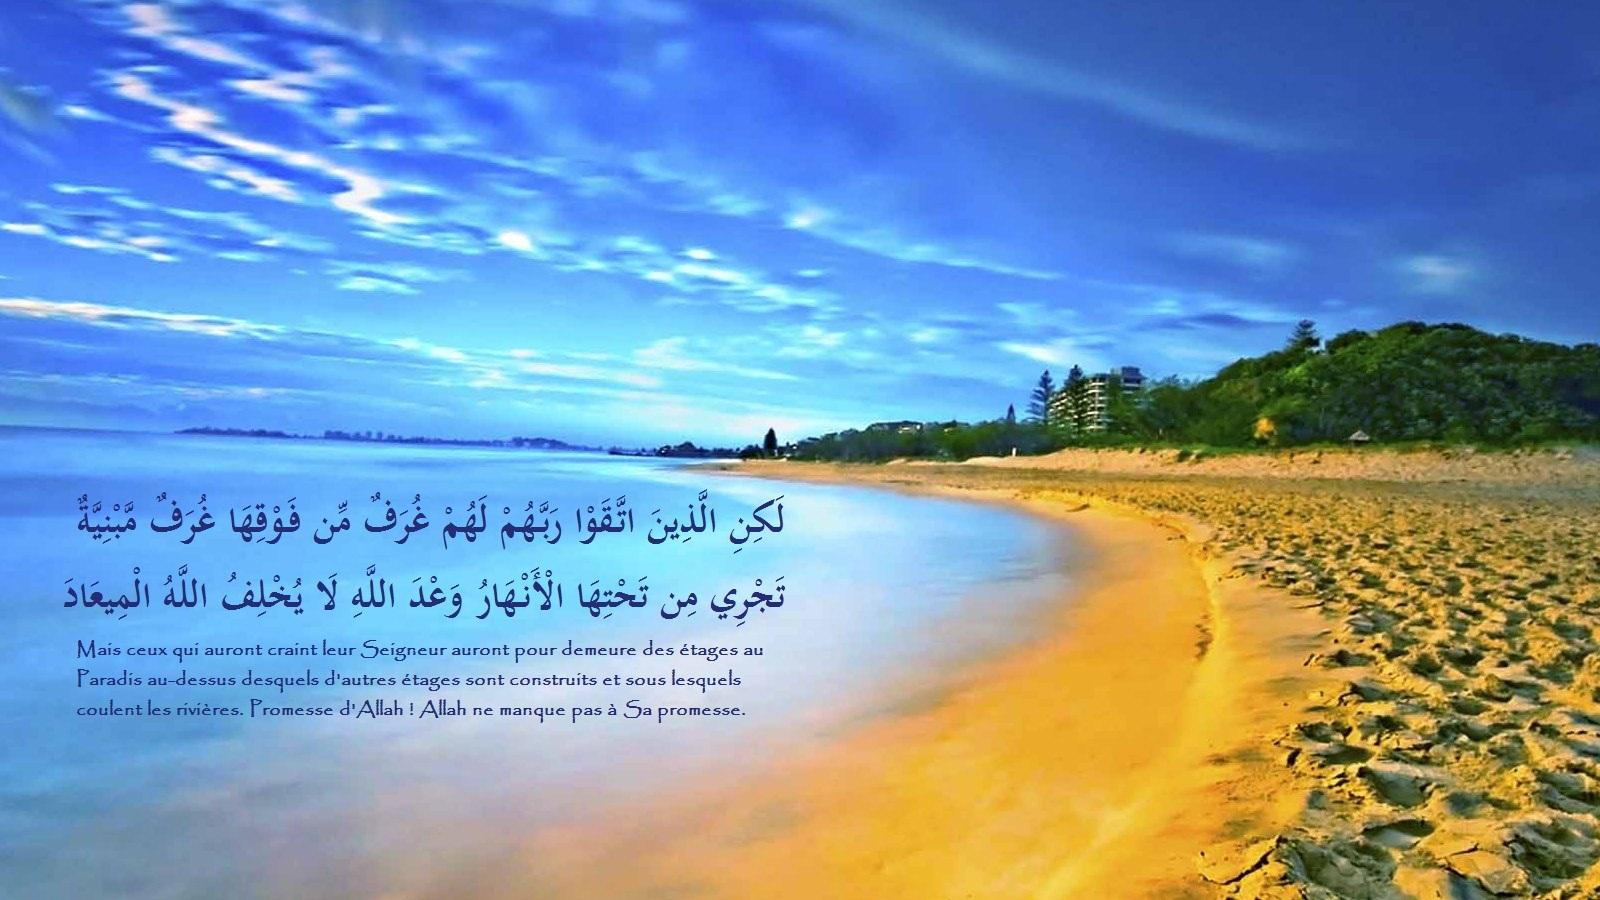 Fond ecran islam for Photo de fond ecran